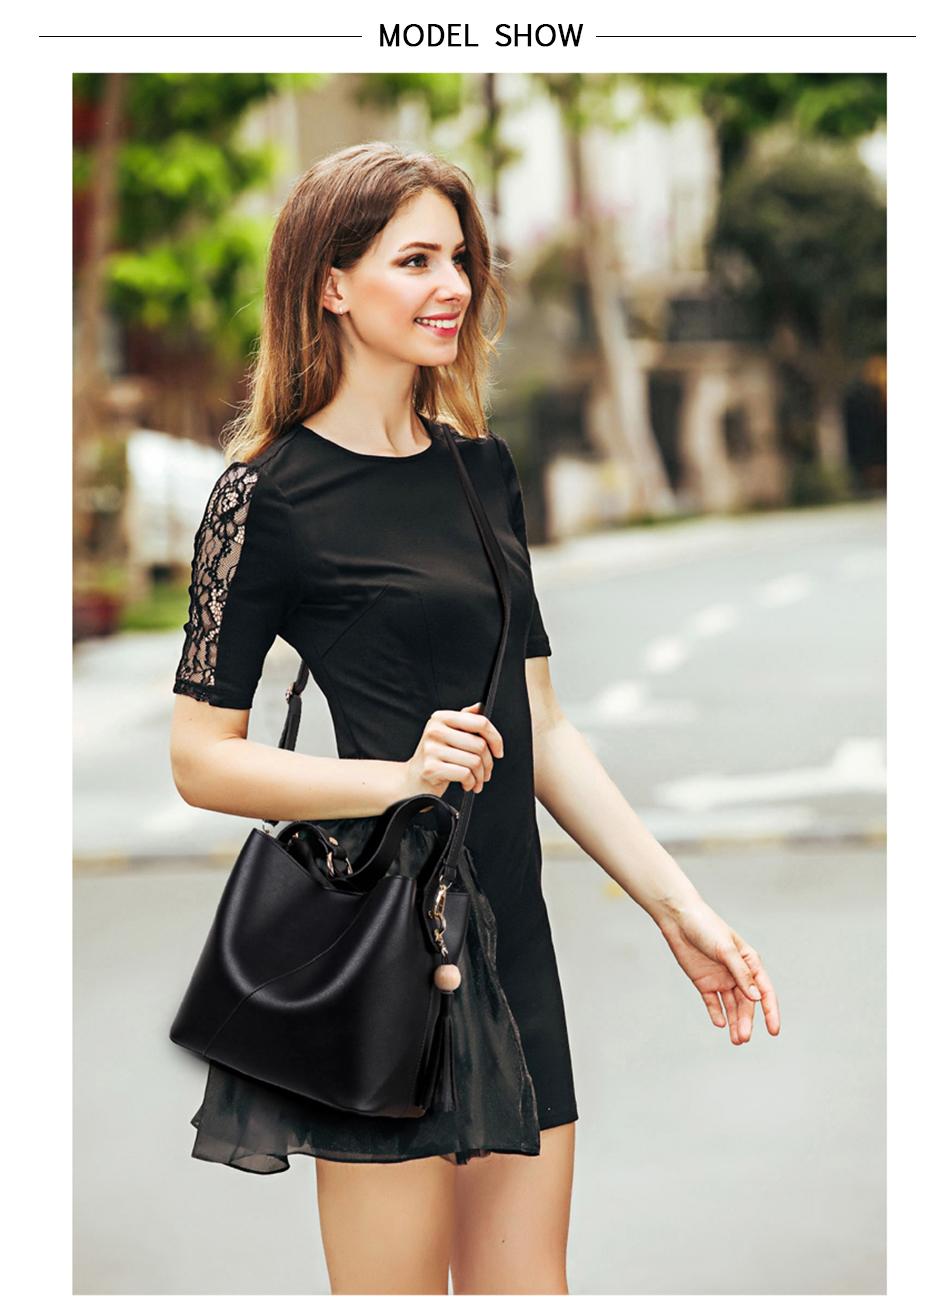 Leather Bag Luxury PU Women Shoulder Bags Handbag Brand Designer Bags New 17 Fashion Ladies Hand Bag Women's Bolsa Feminina 5